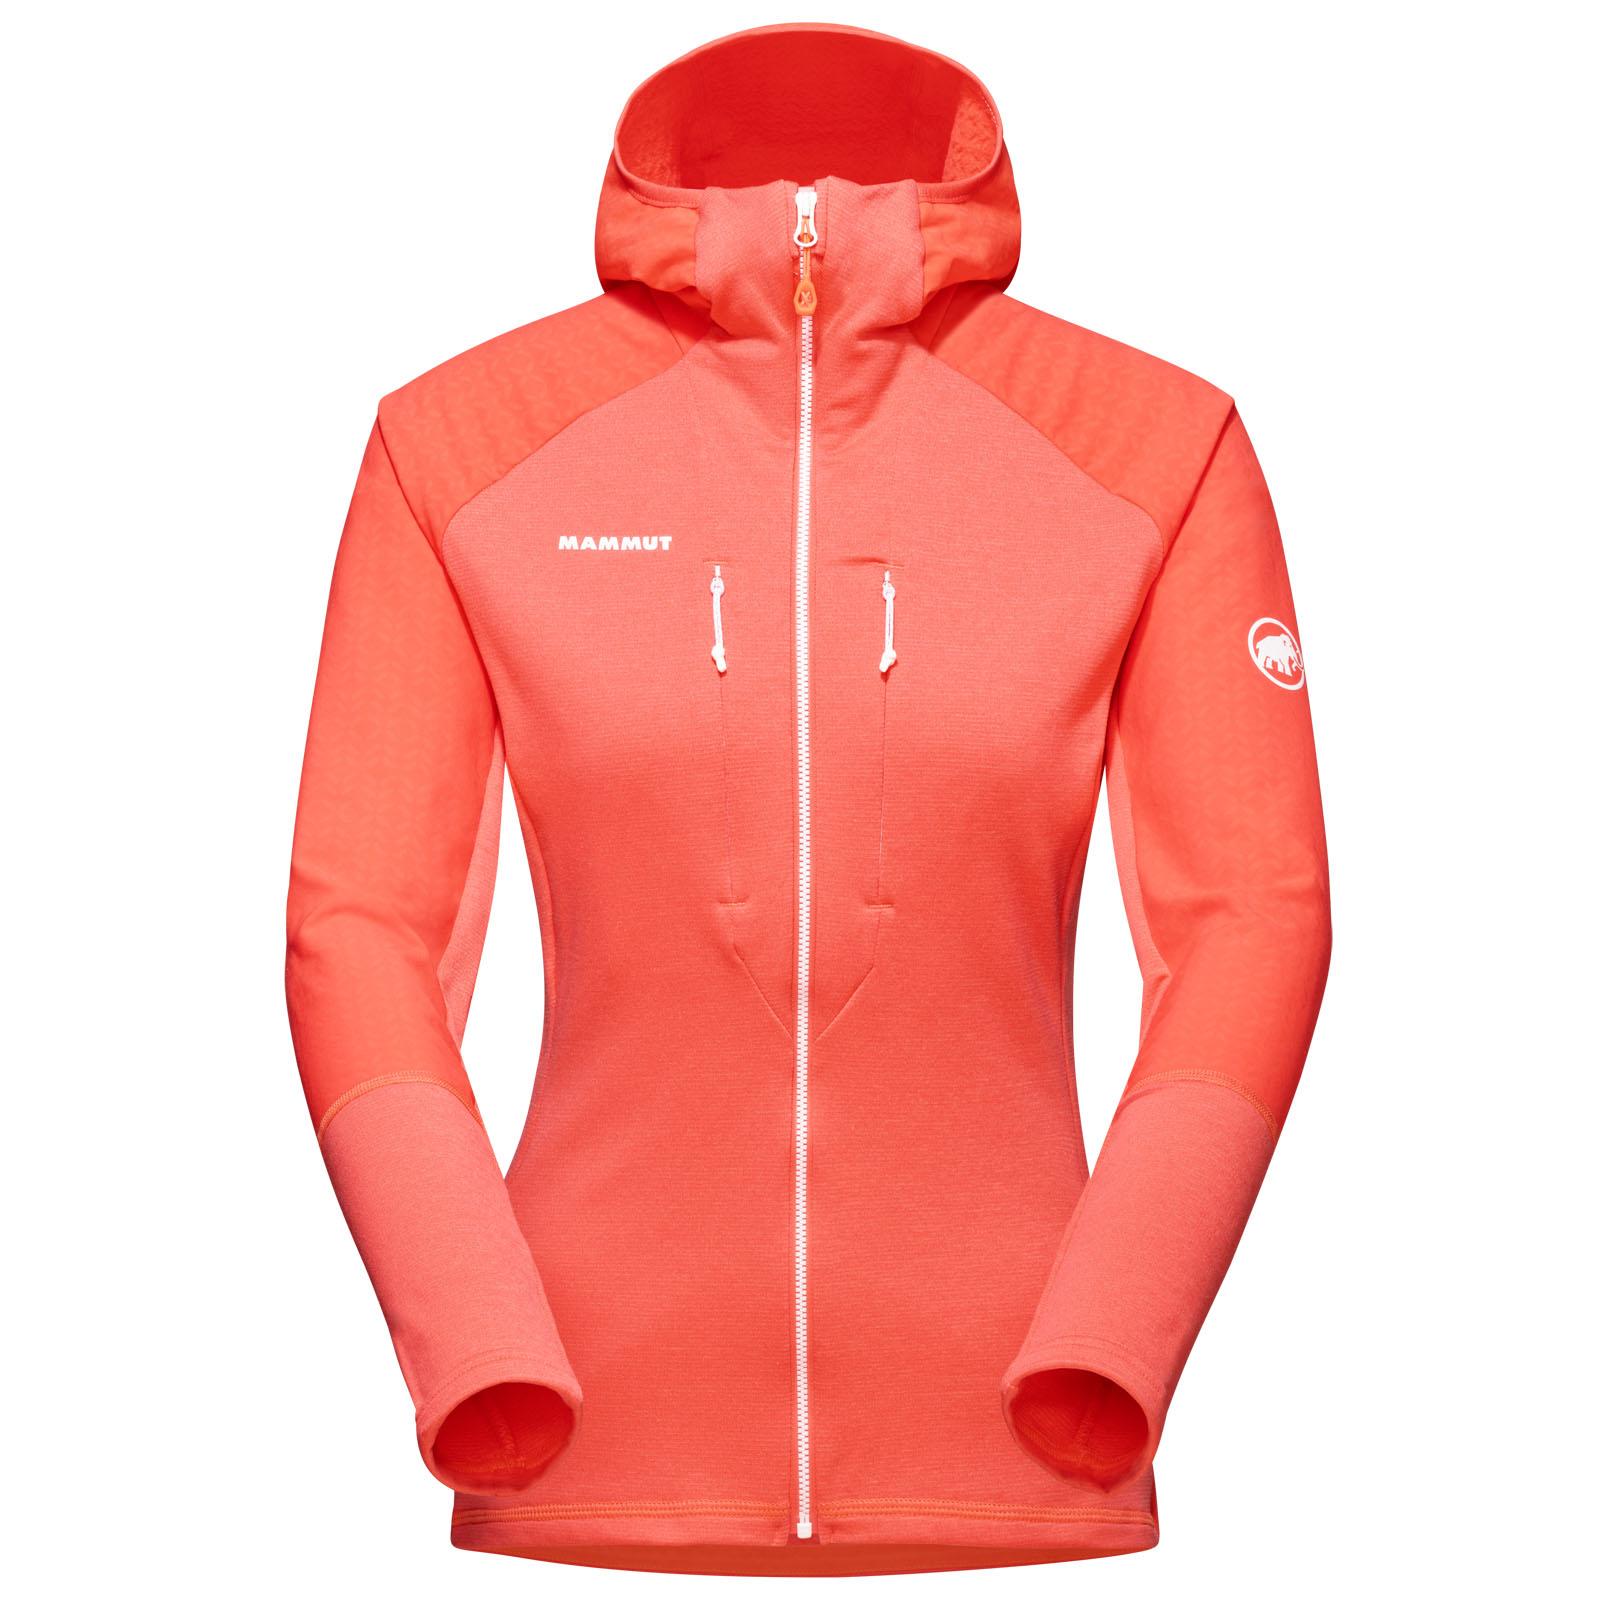 Mammut Eiswand Advanced Hooded Midlayer Jacket Women - barberry